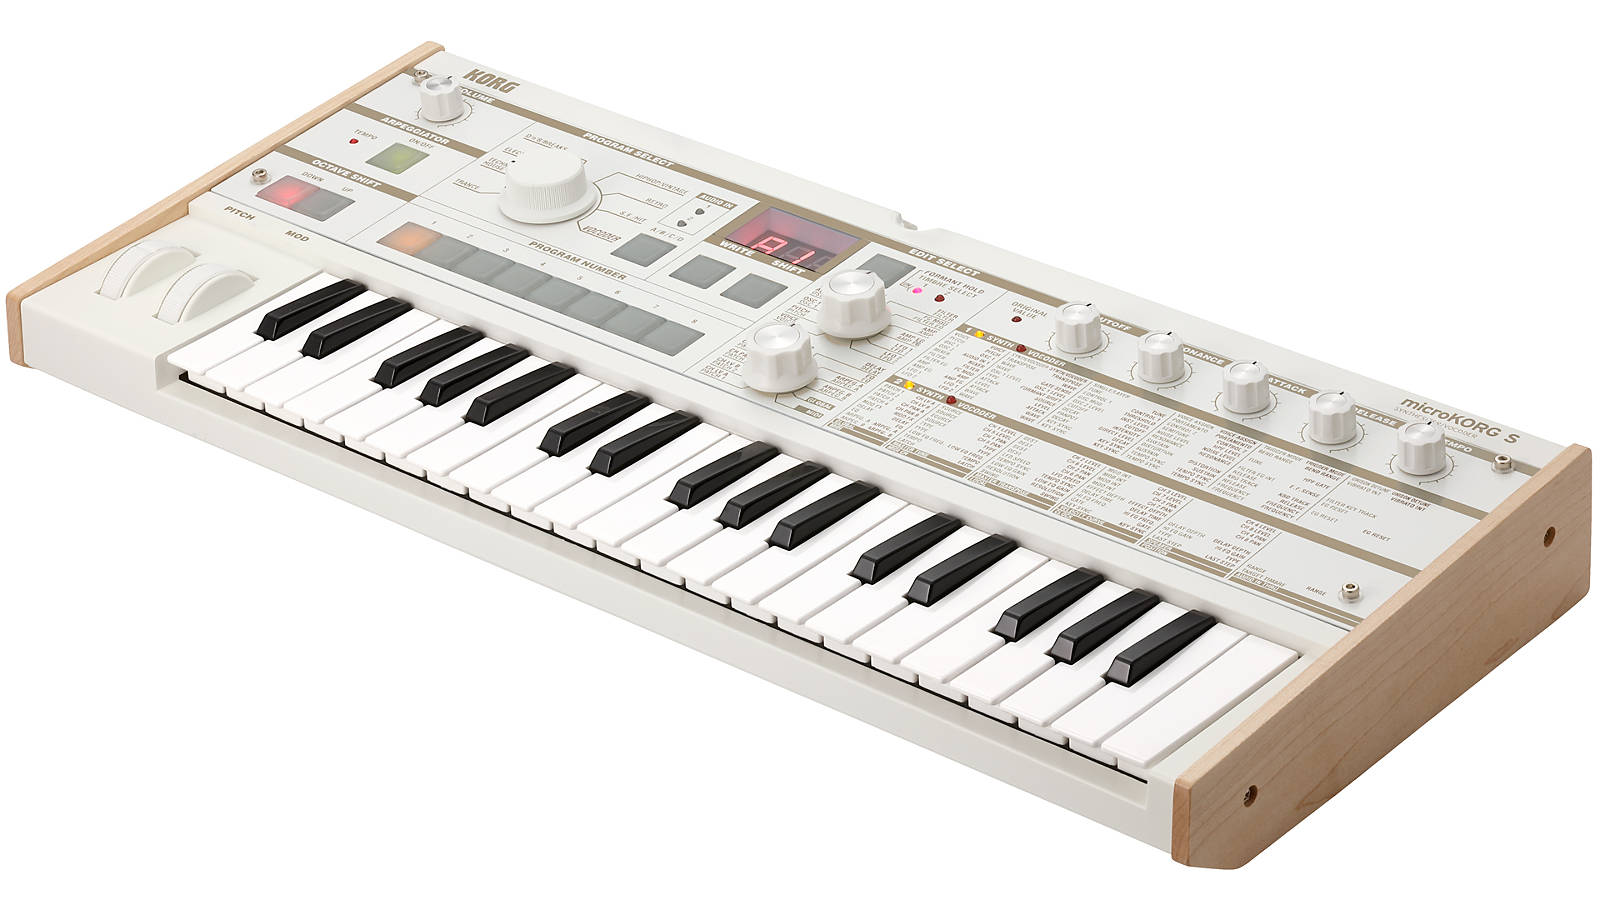 KORG microKORG S vituell-analoger Synthesizer mit Vocoder